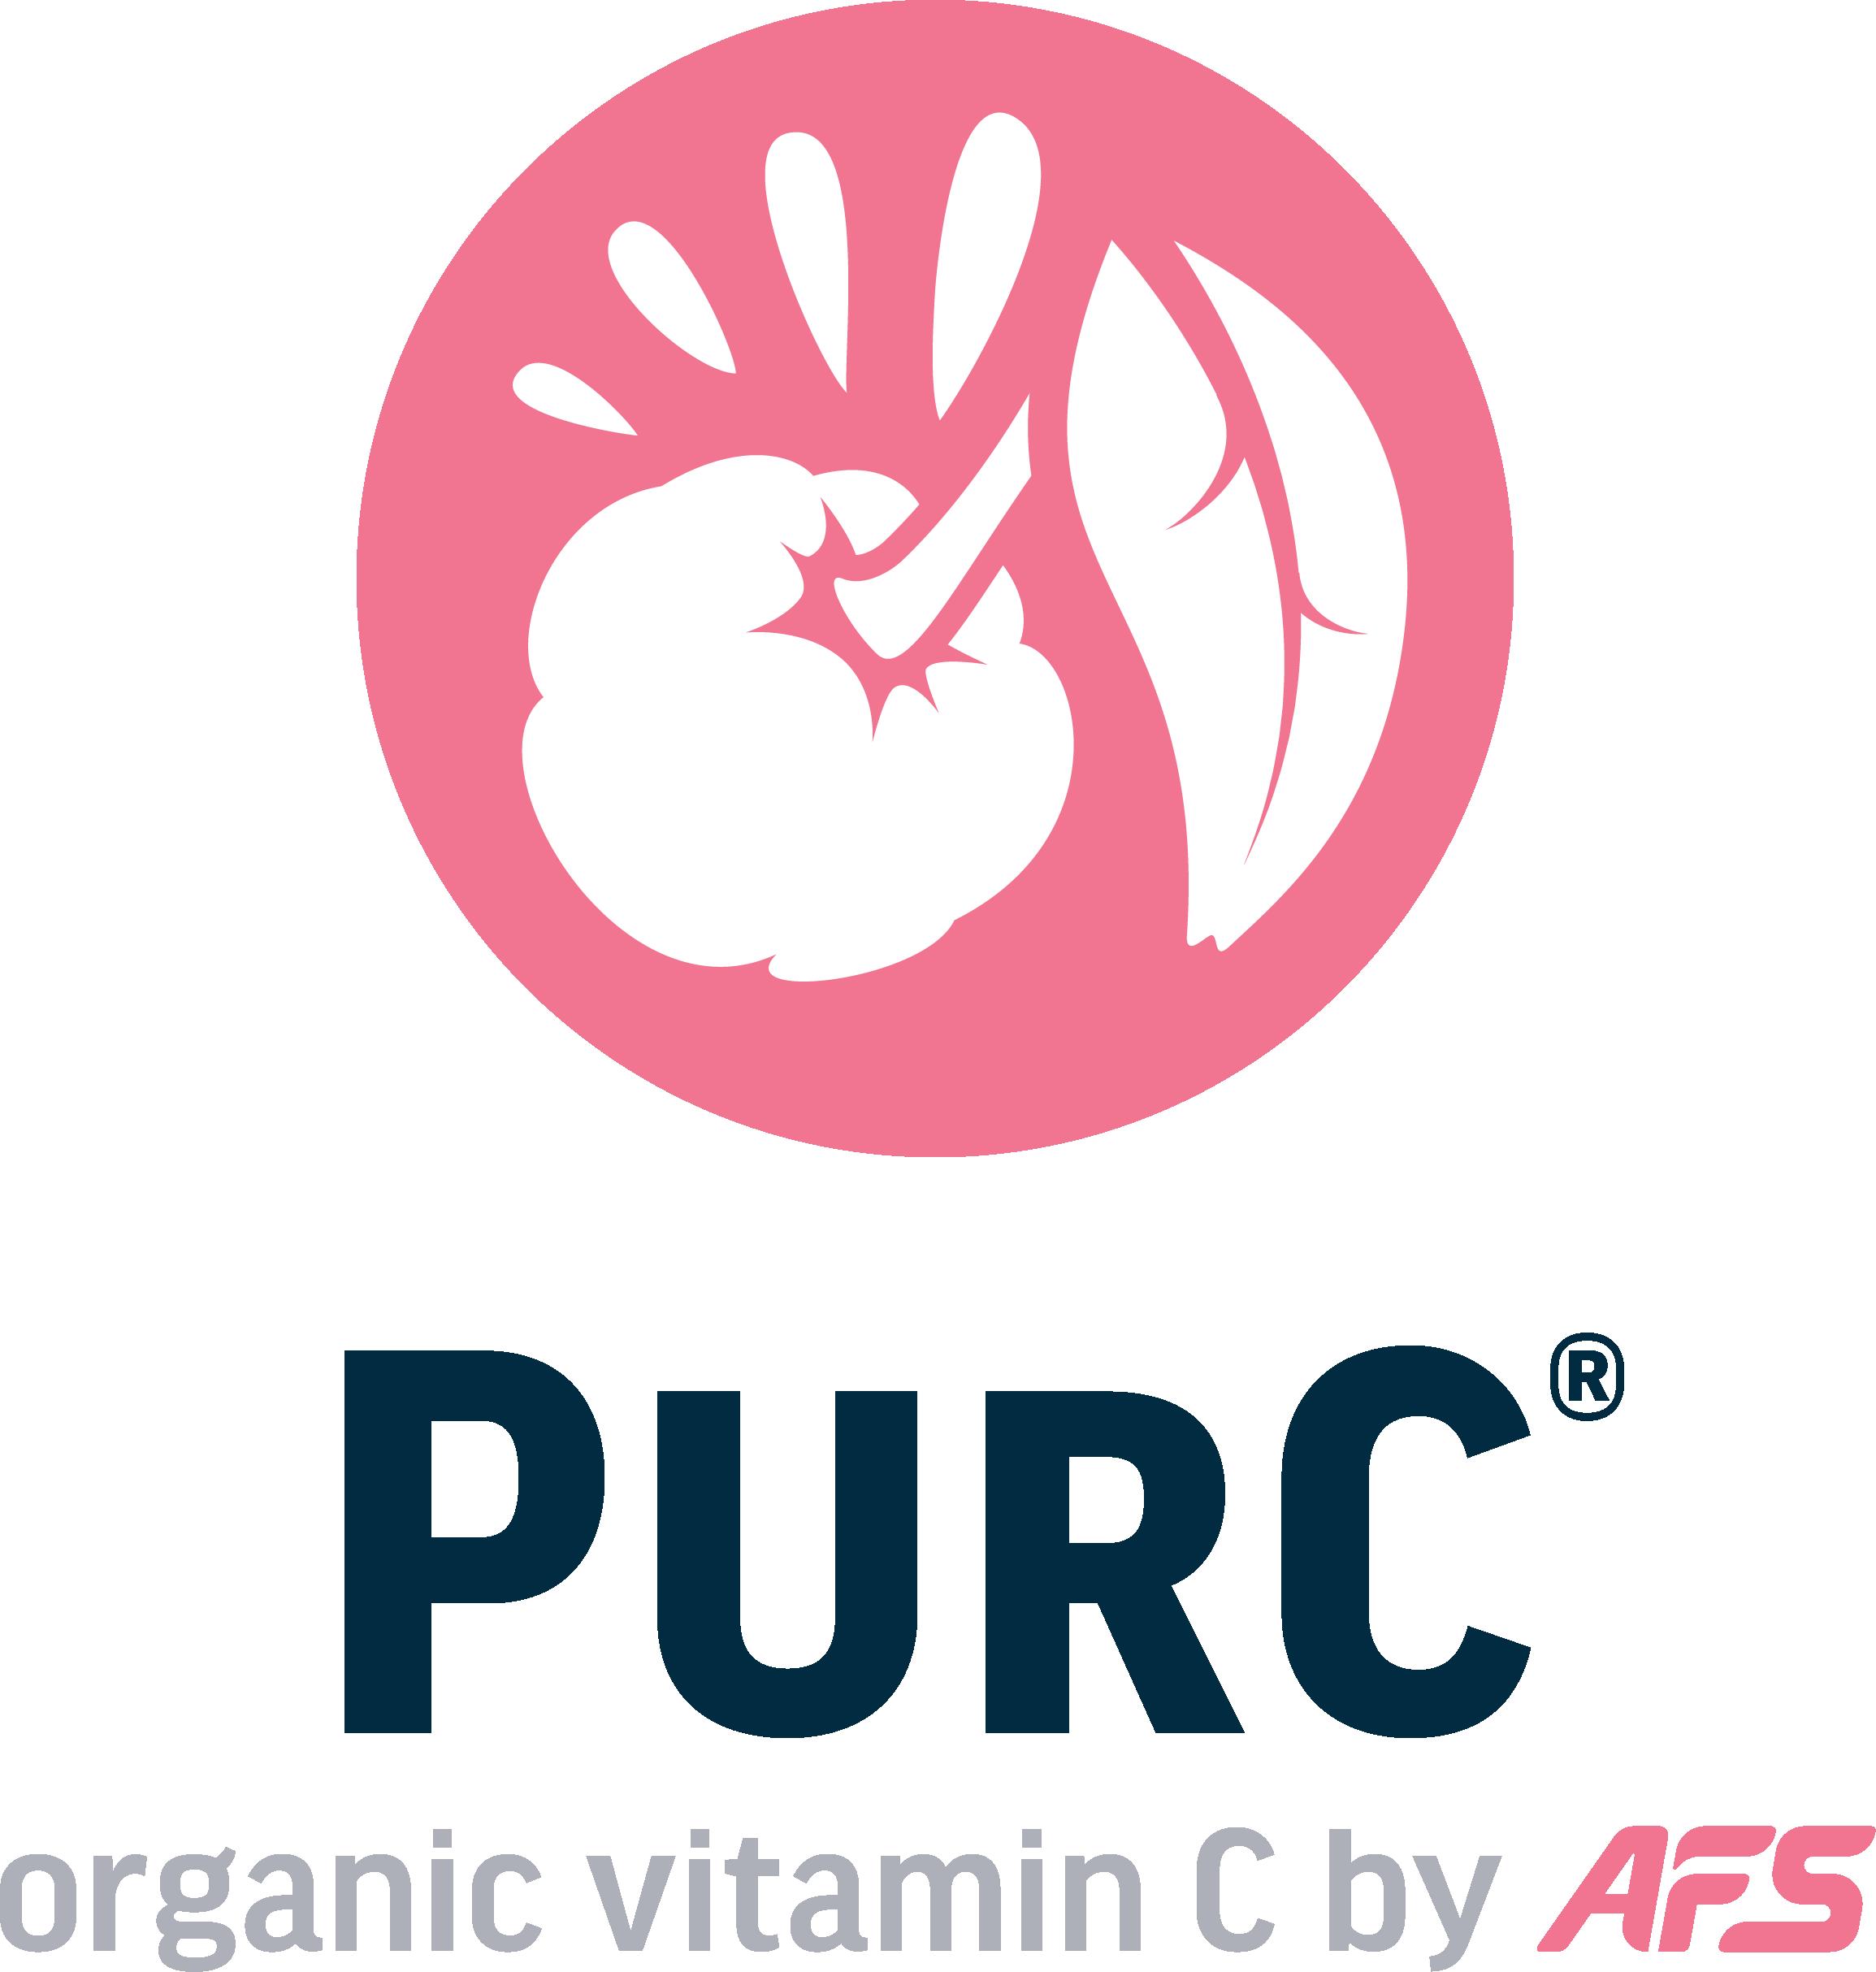 PurC® Organic Vitamin C Extract